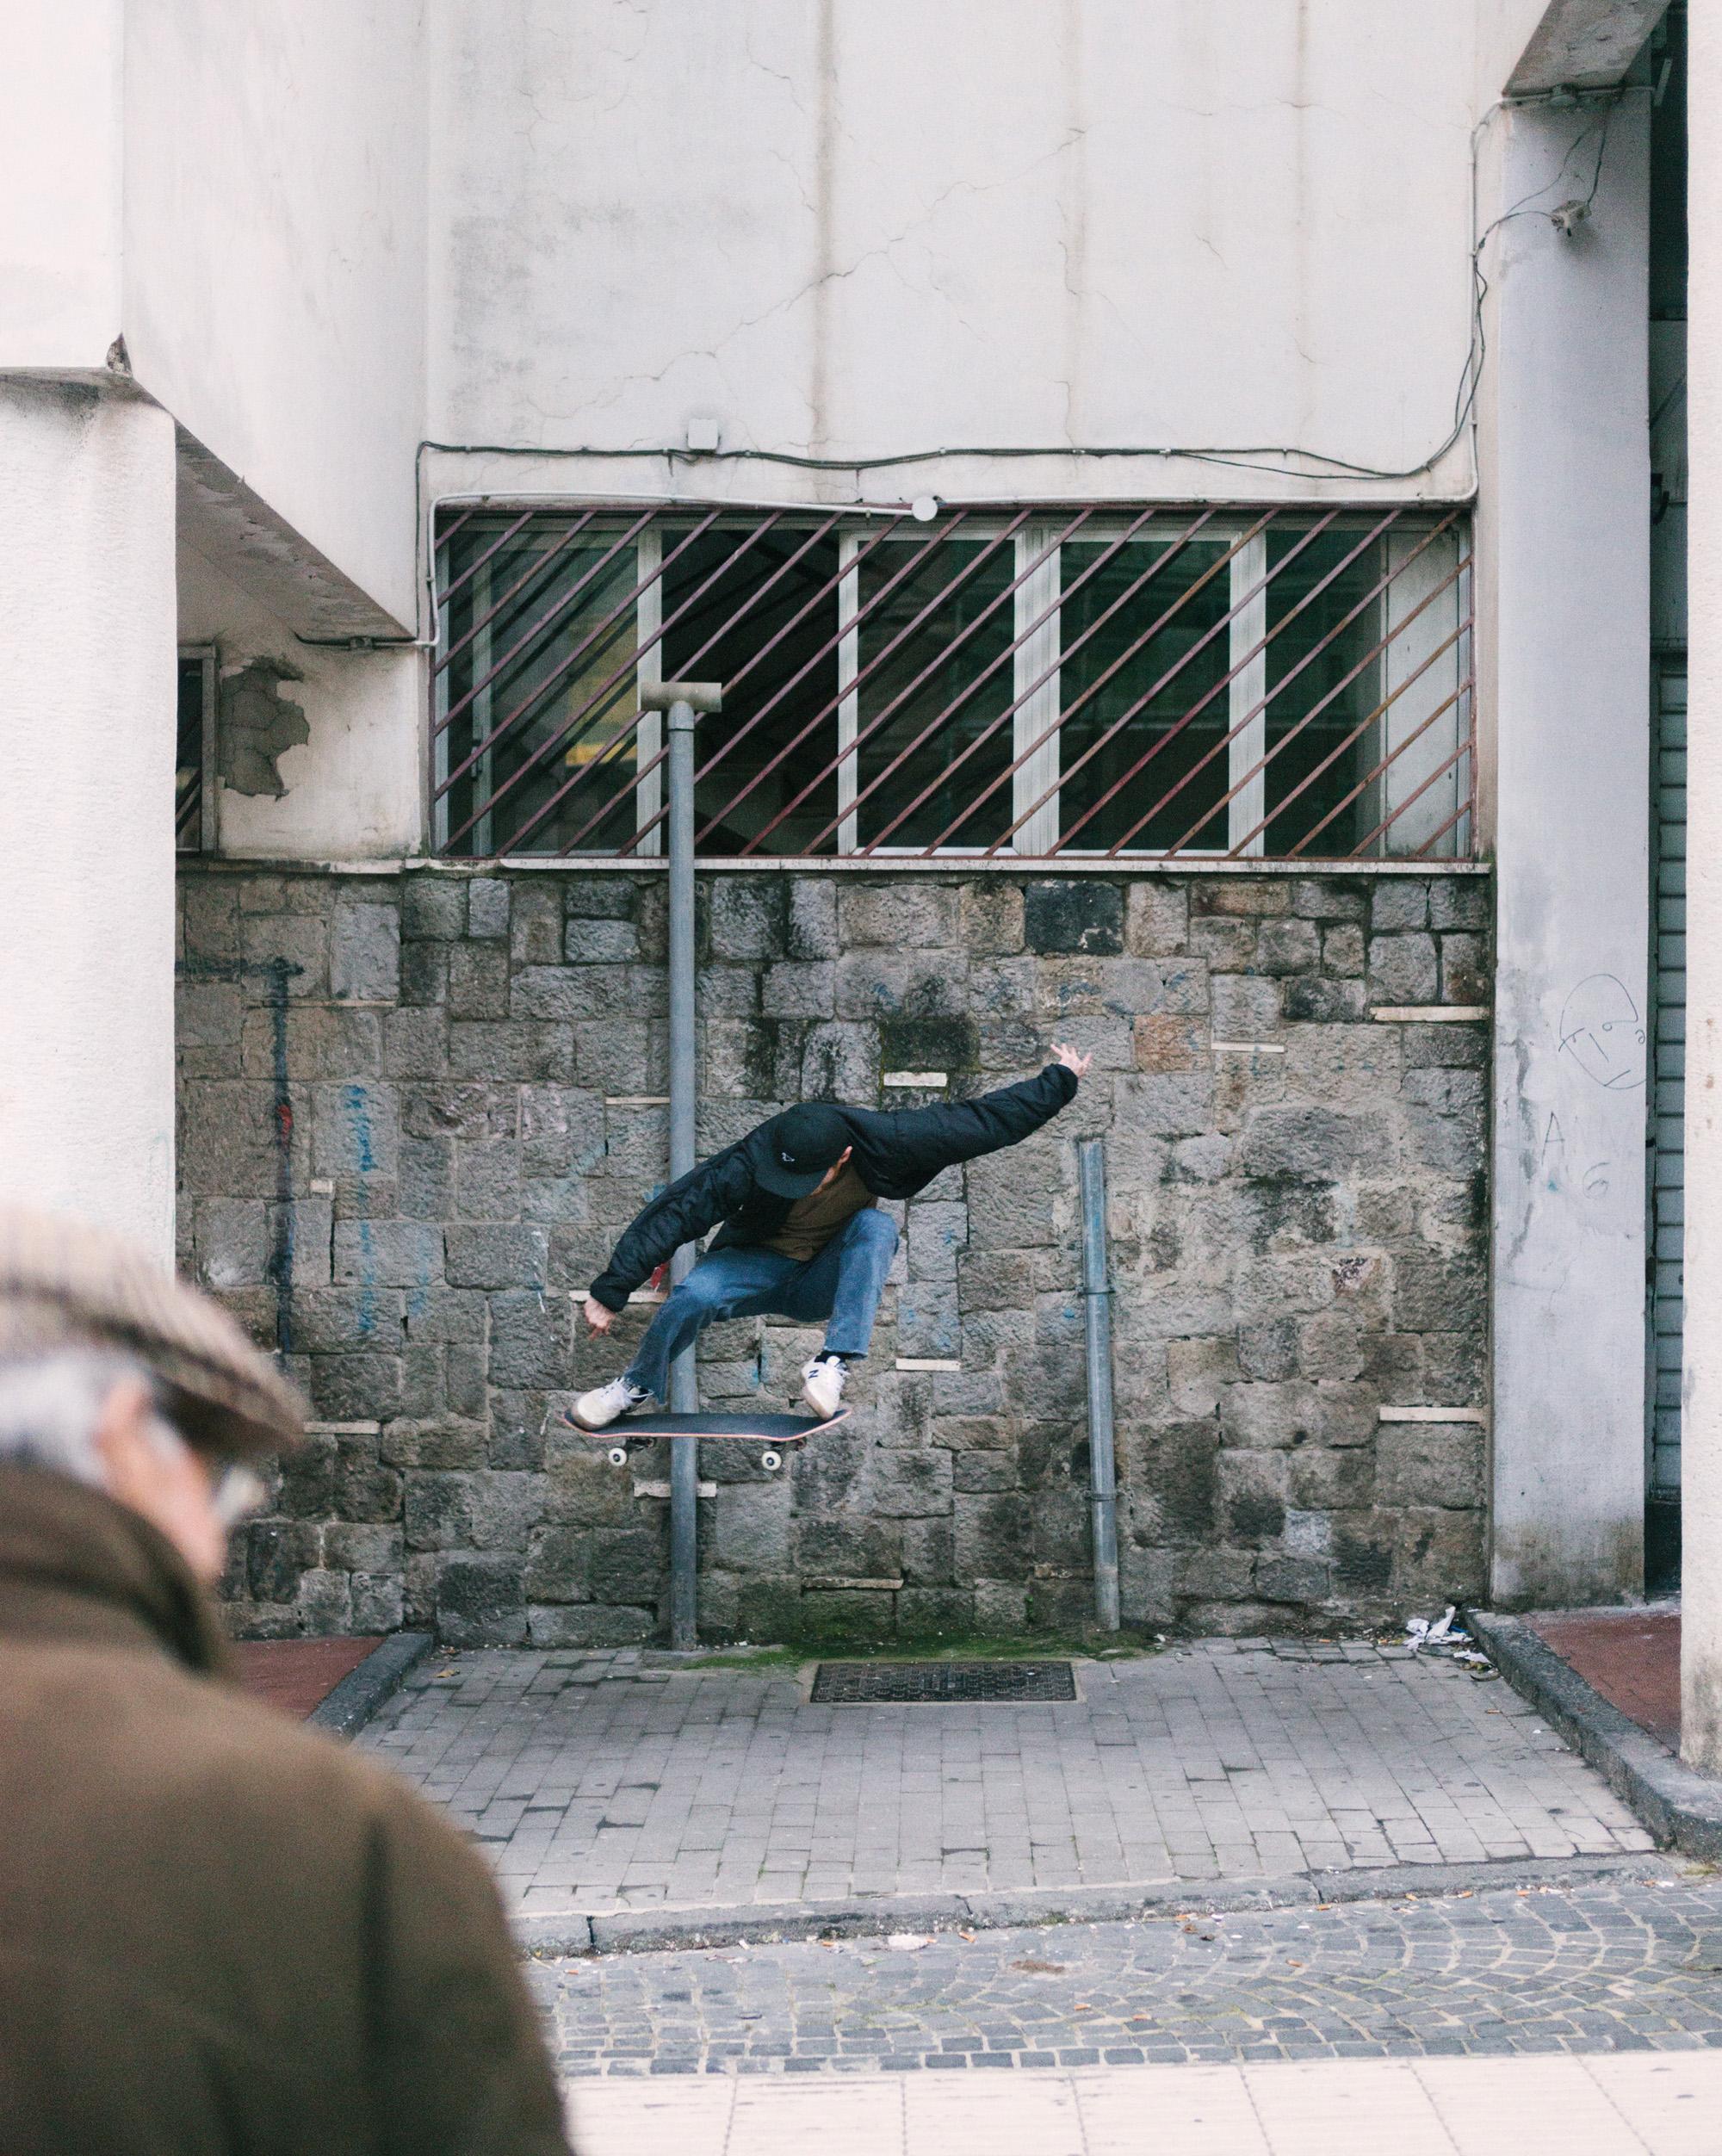 Charlie Munro – switch ollie. Photo: Maxime Verret